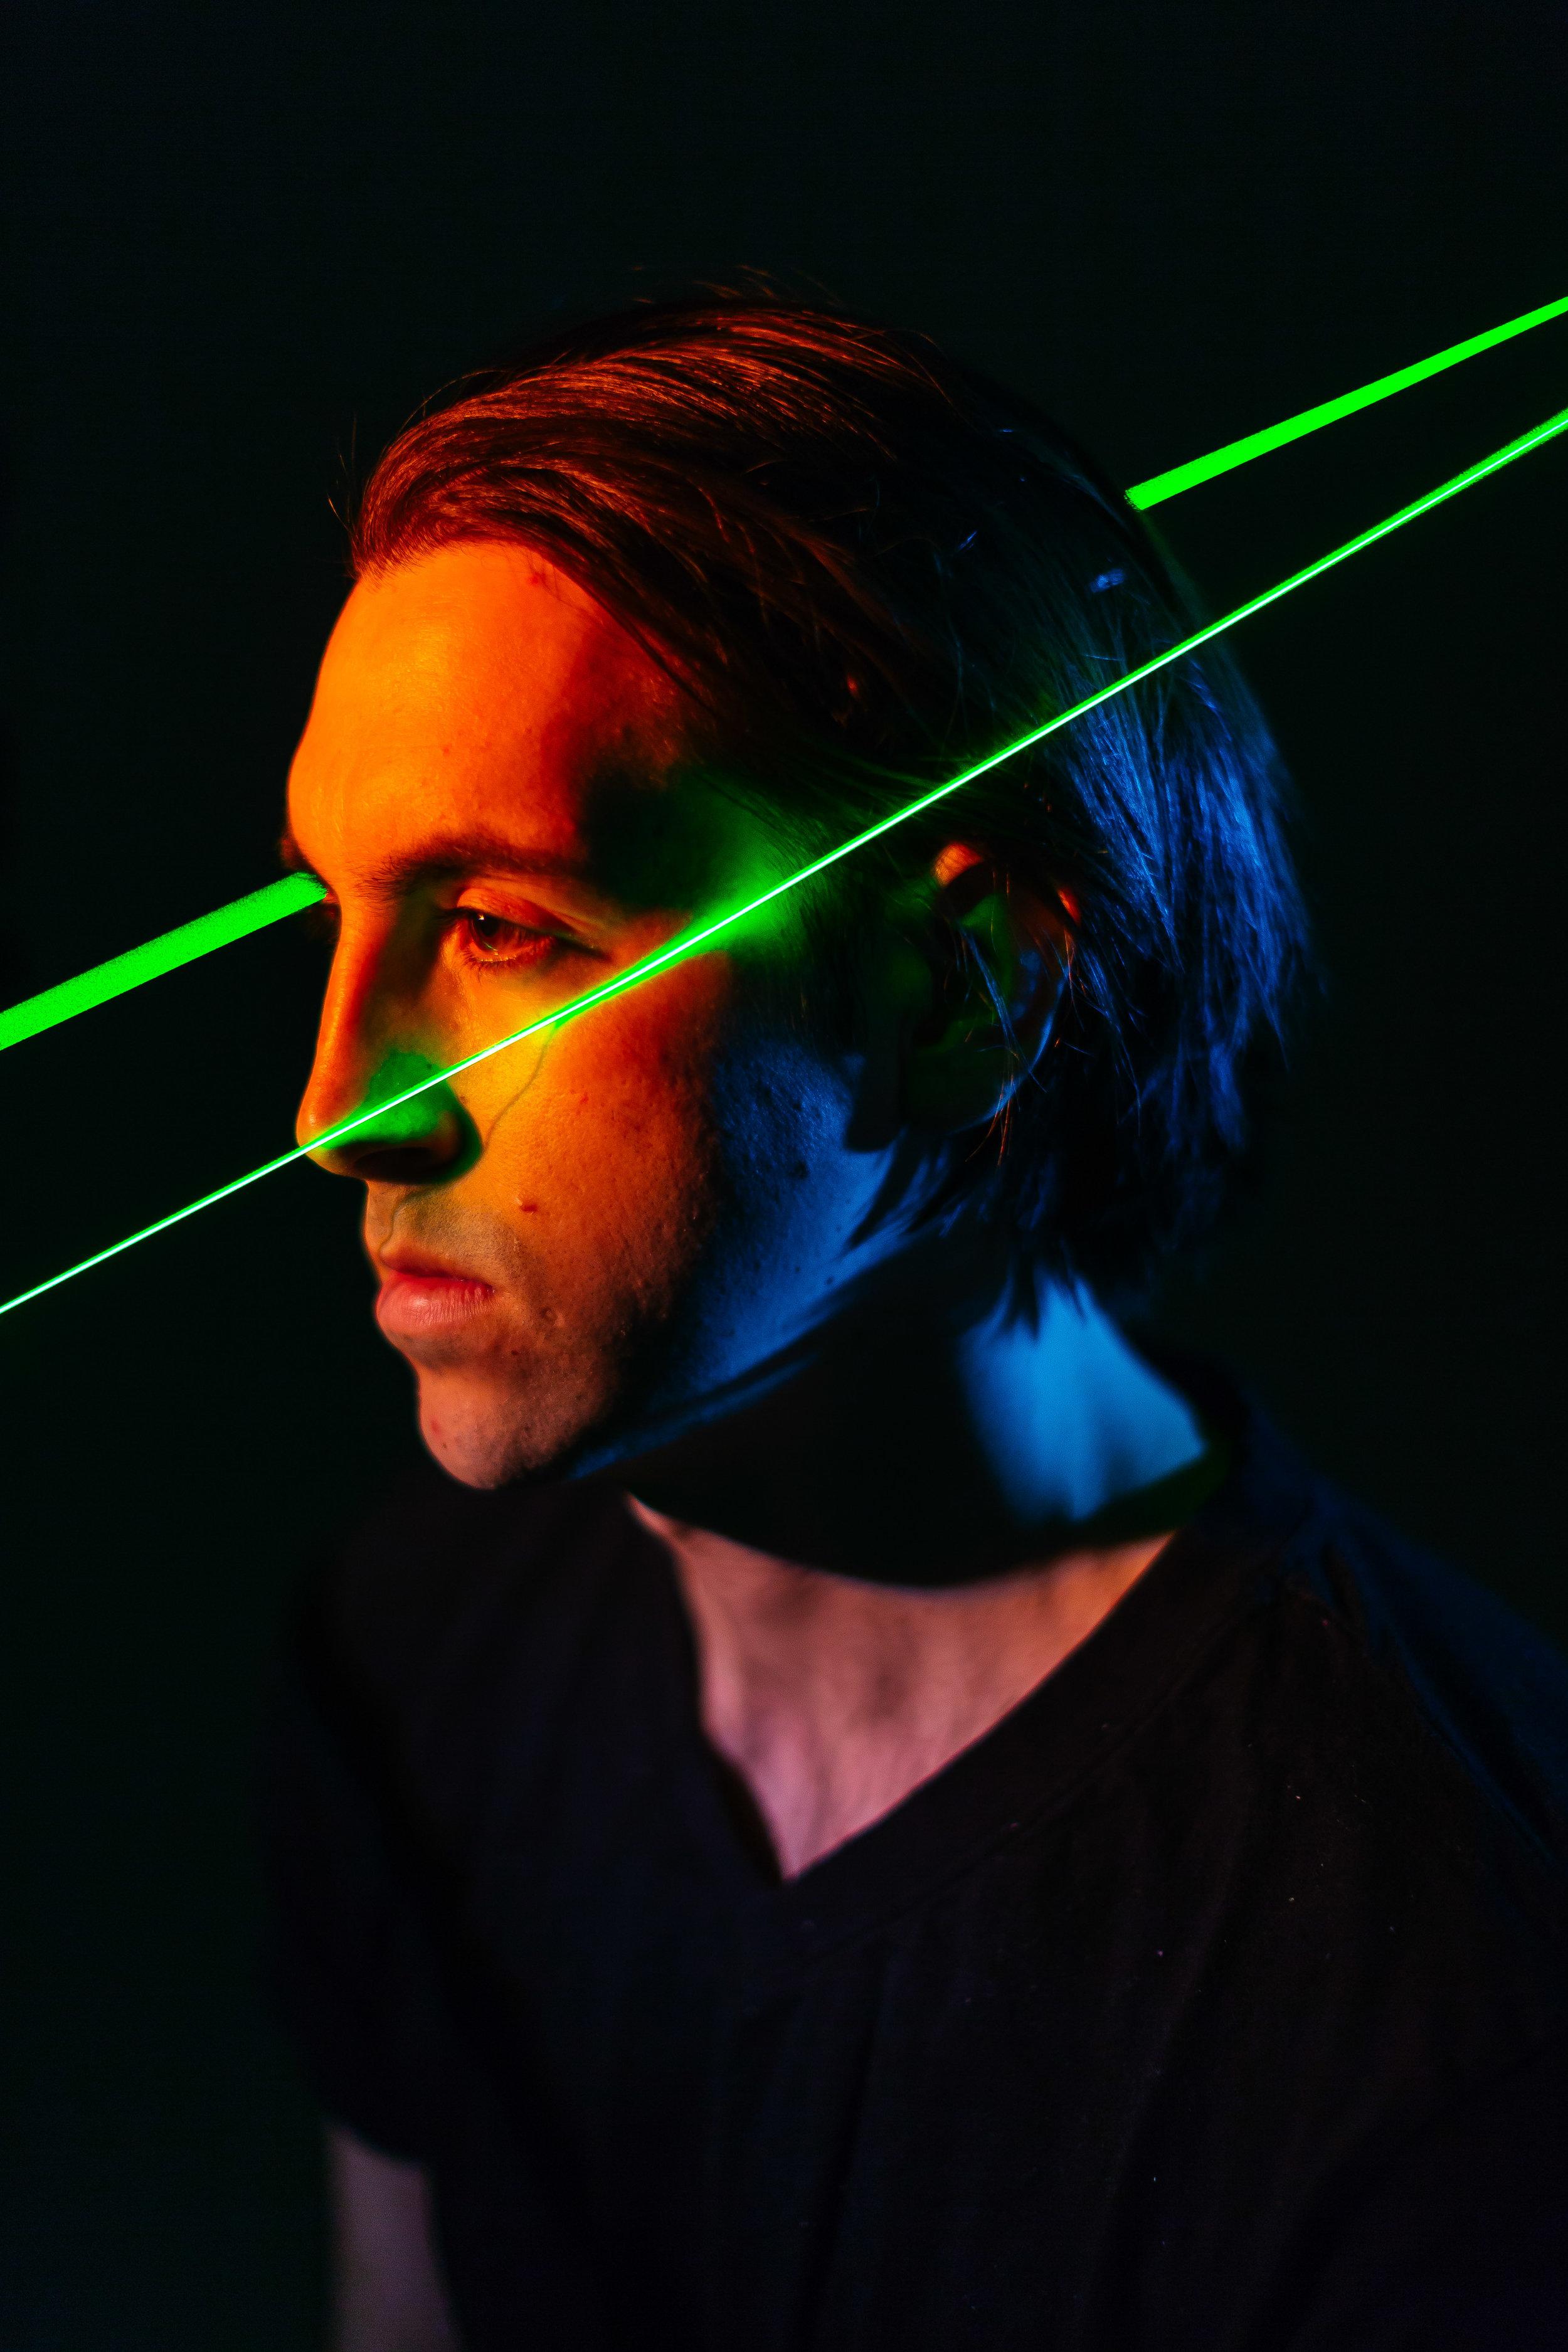 20180321-lasers-retouchedish-3.jpg